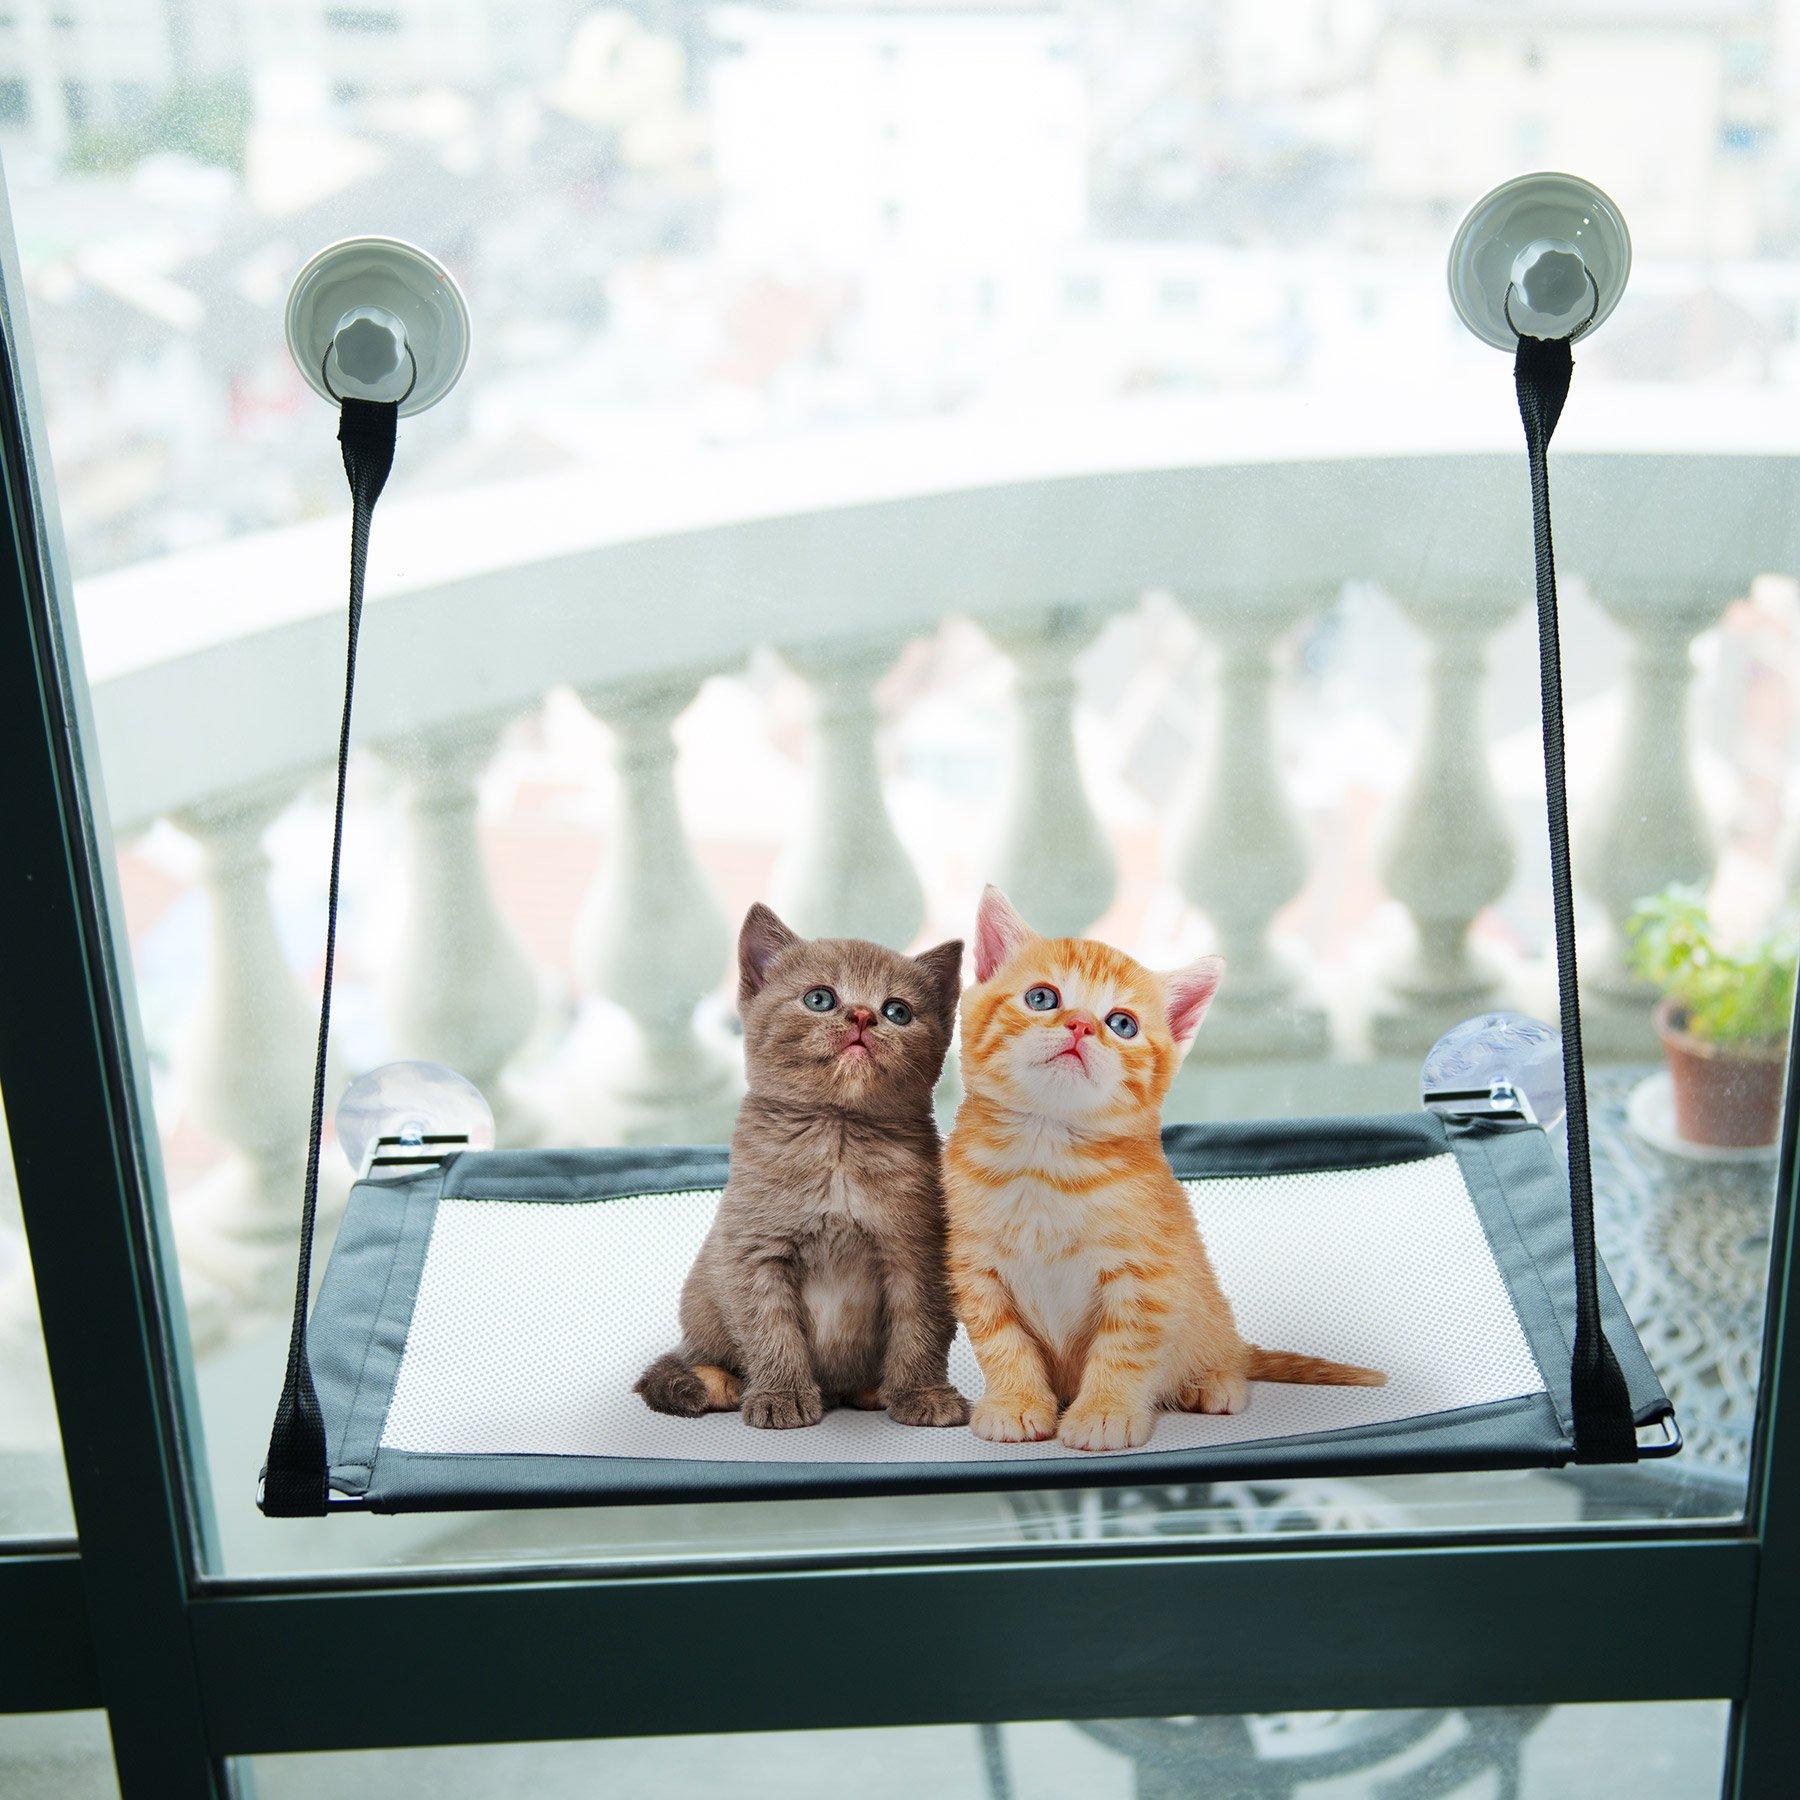 CO-Z Kitty Window Mount Cat Window Perches Resting Hammock with 4 Ultra Heavy